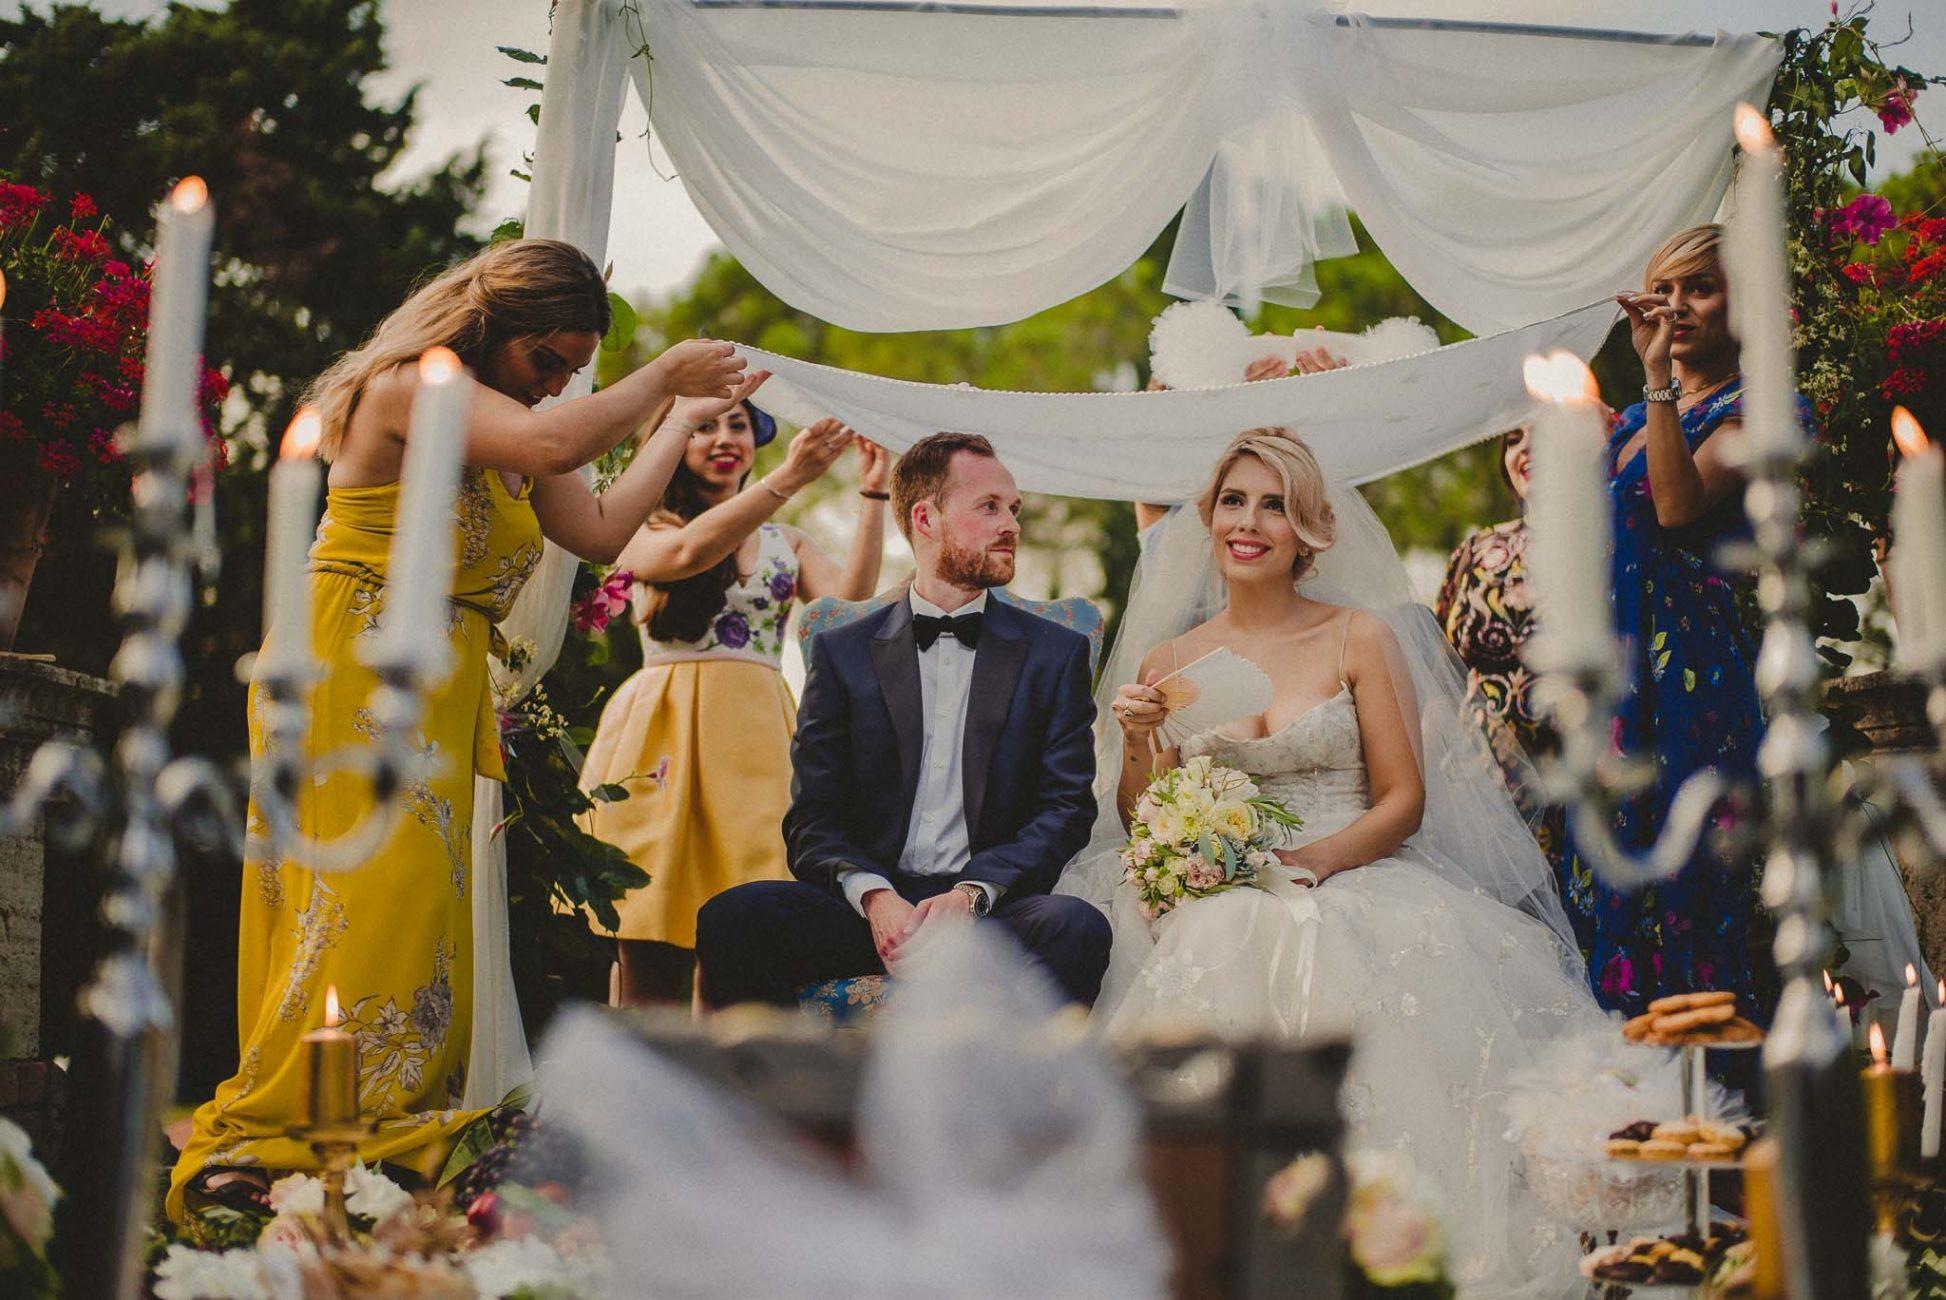 italian wedding reportage - Livio Lacurre photography